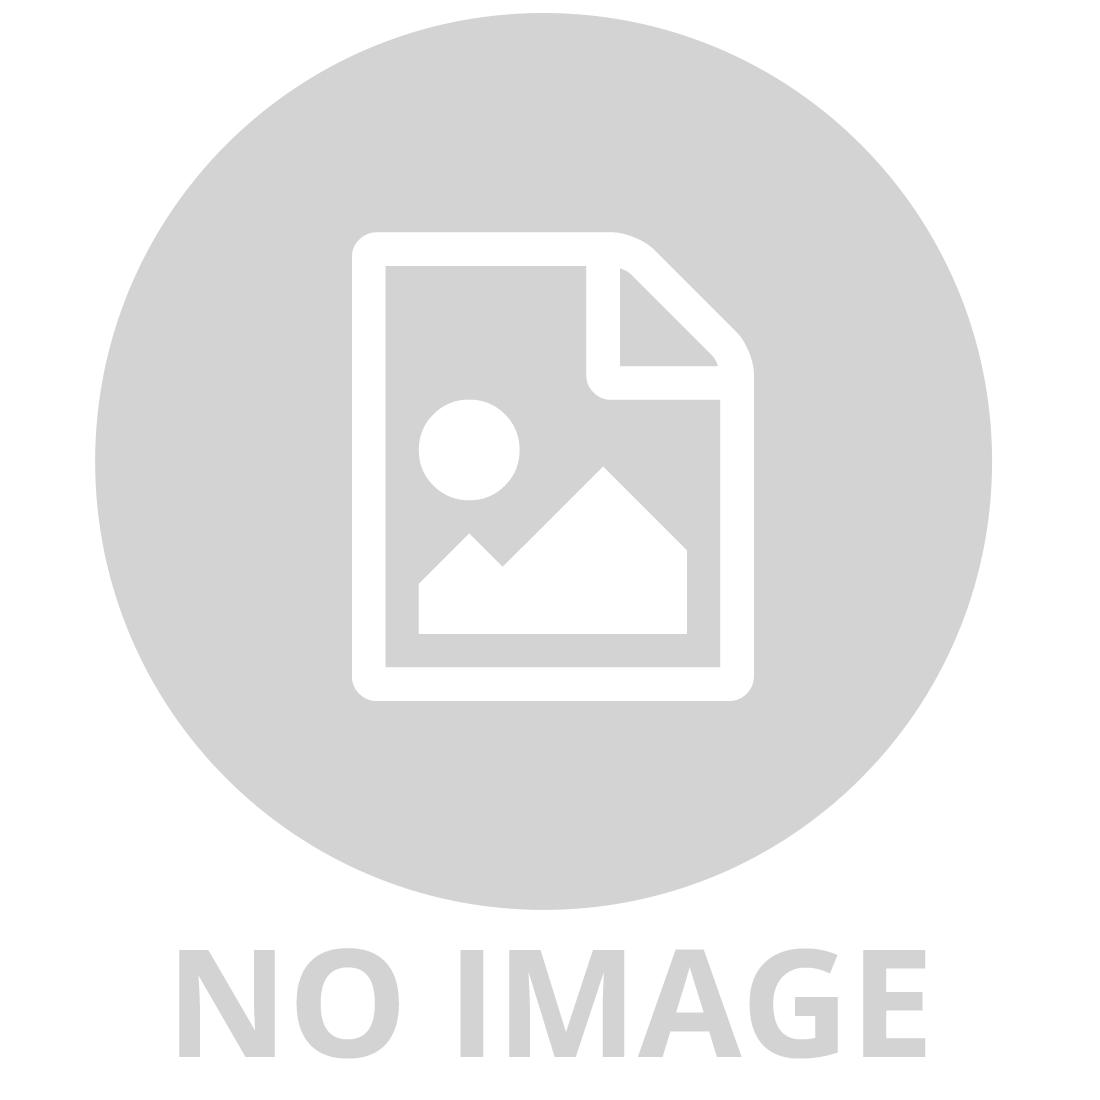 TEAM POWER 120 SOLDIERS